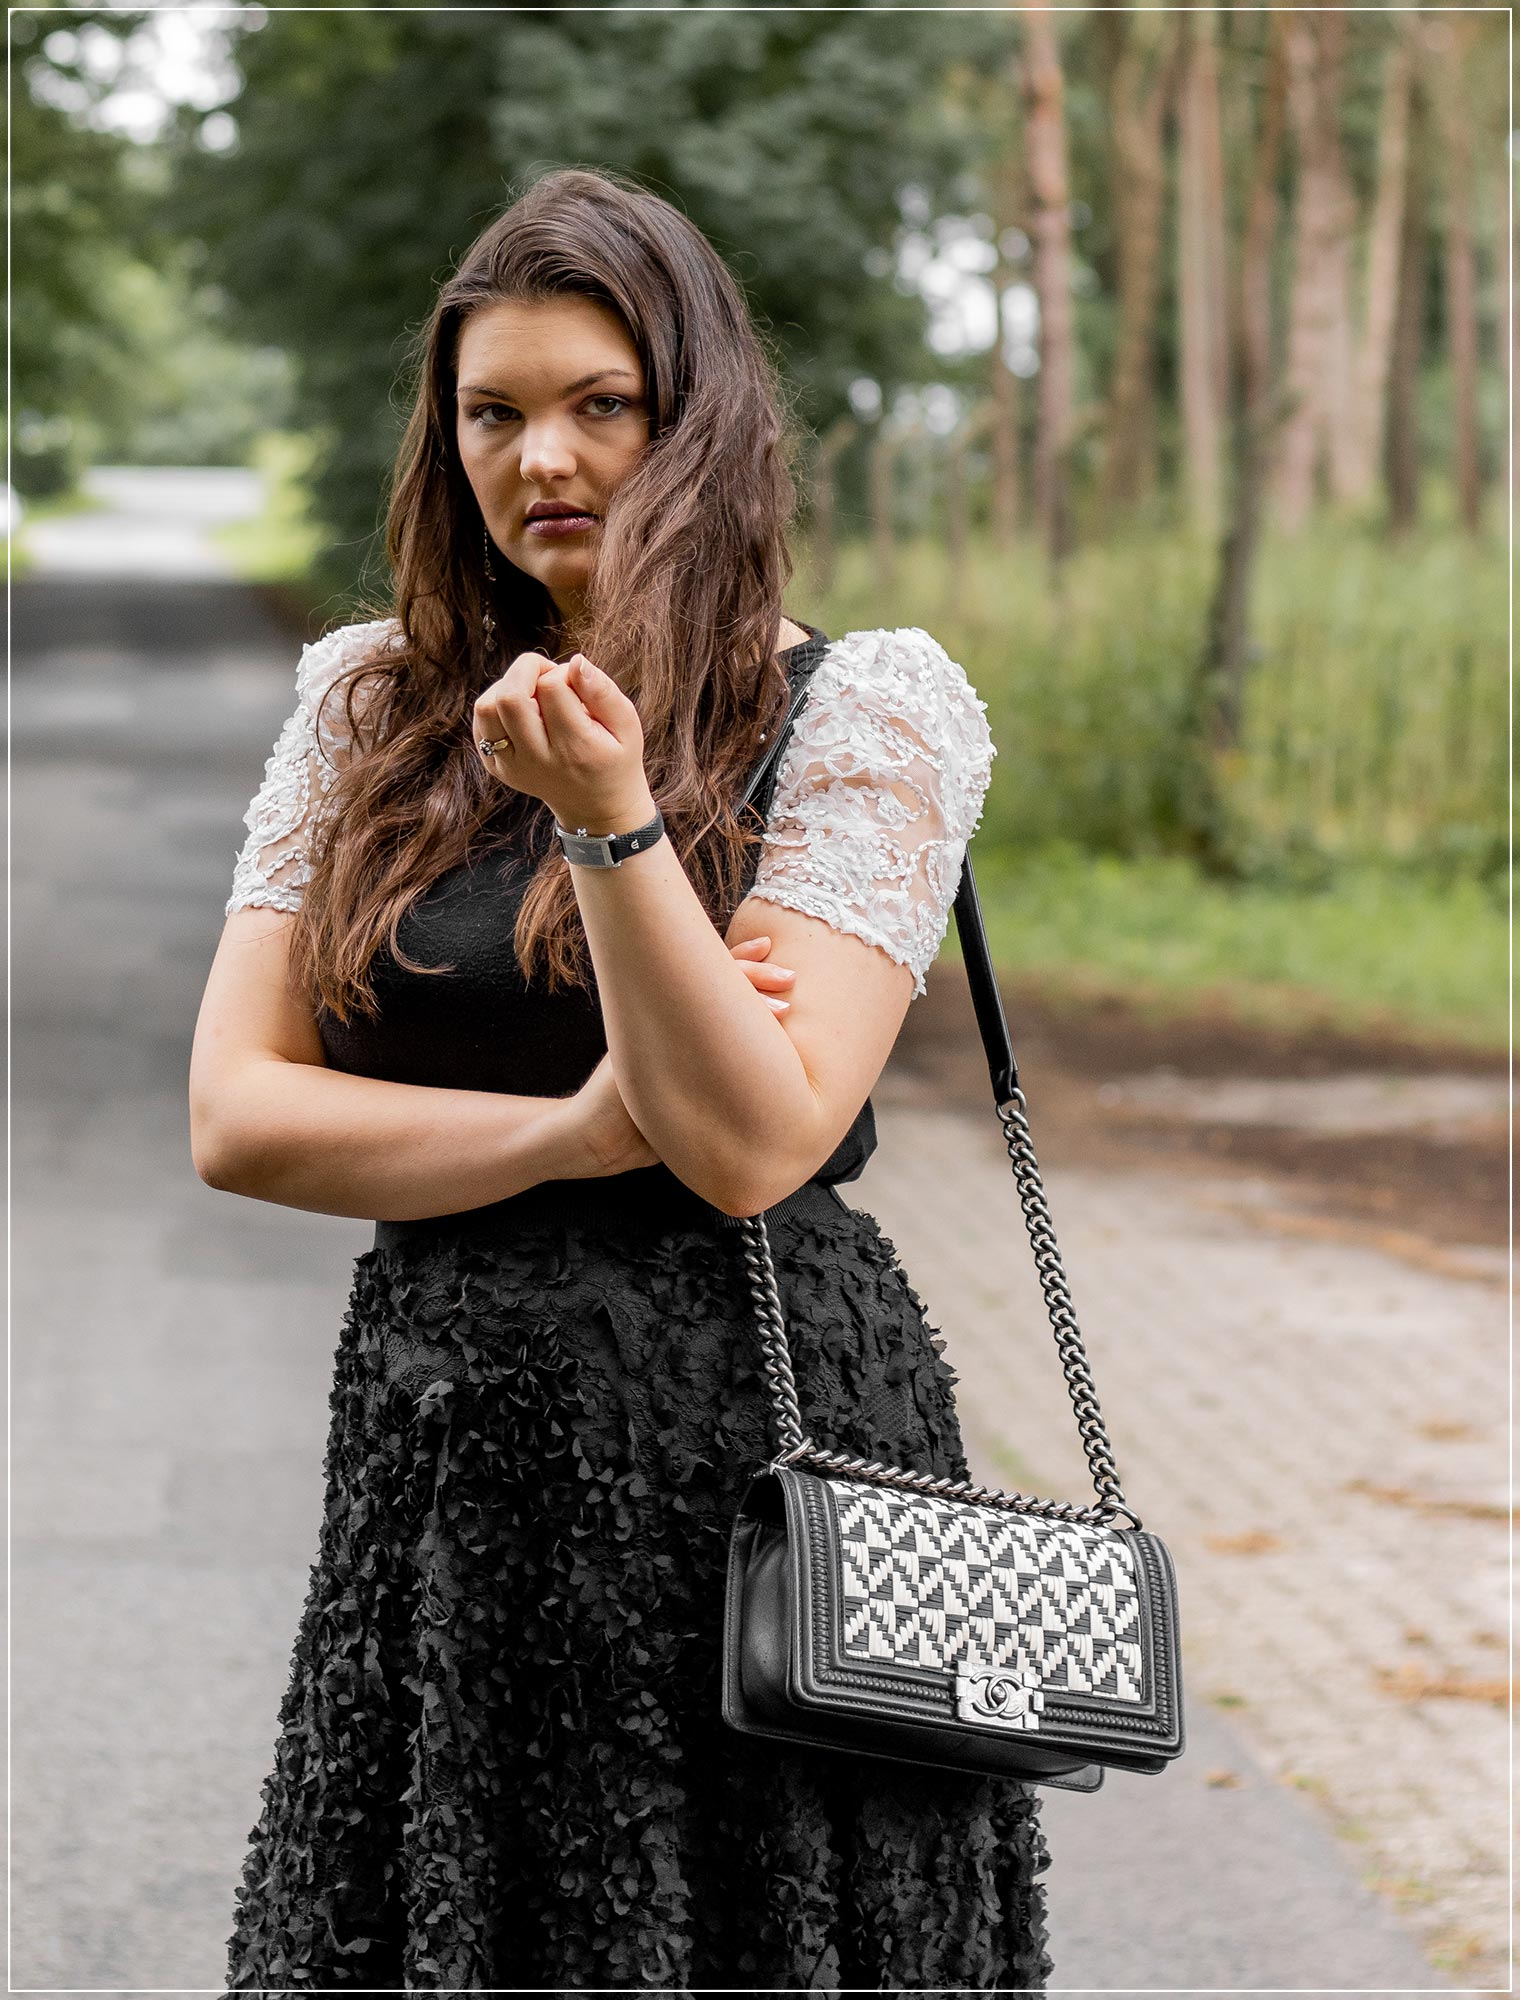 eleganter Sommerlook Black and White Look mit 3D-Spitze